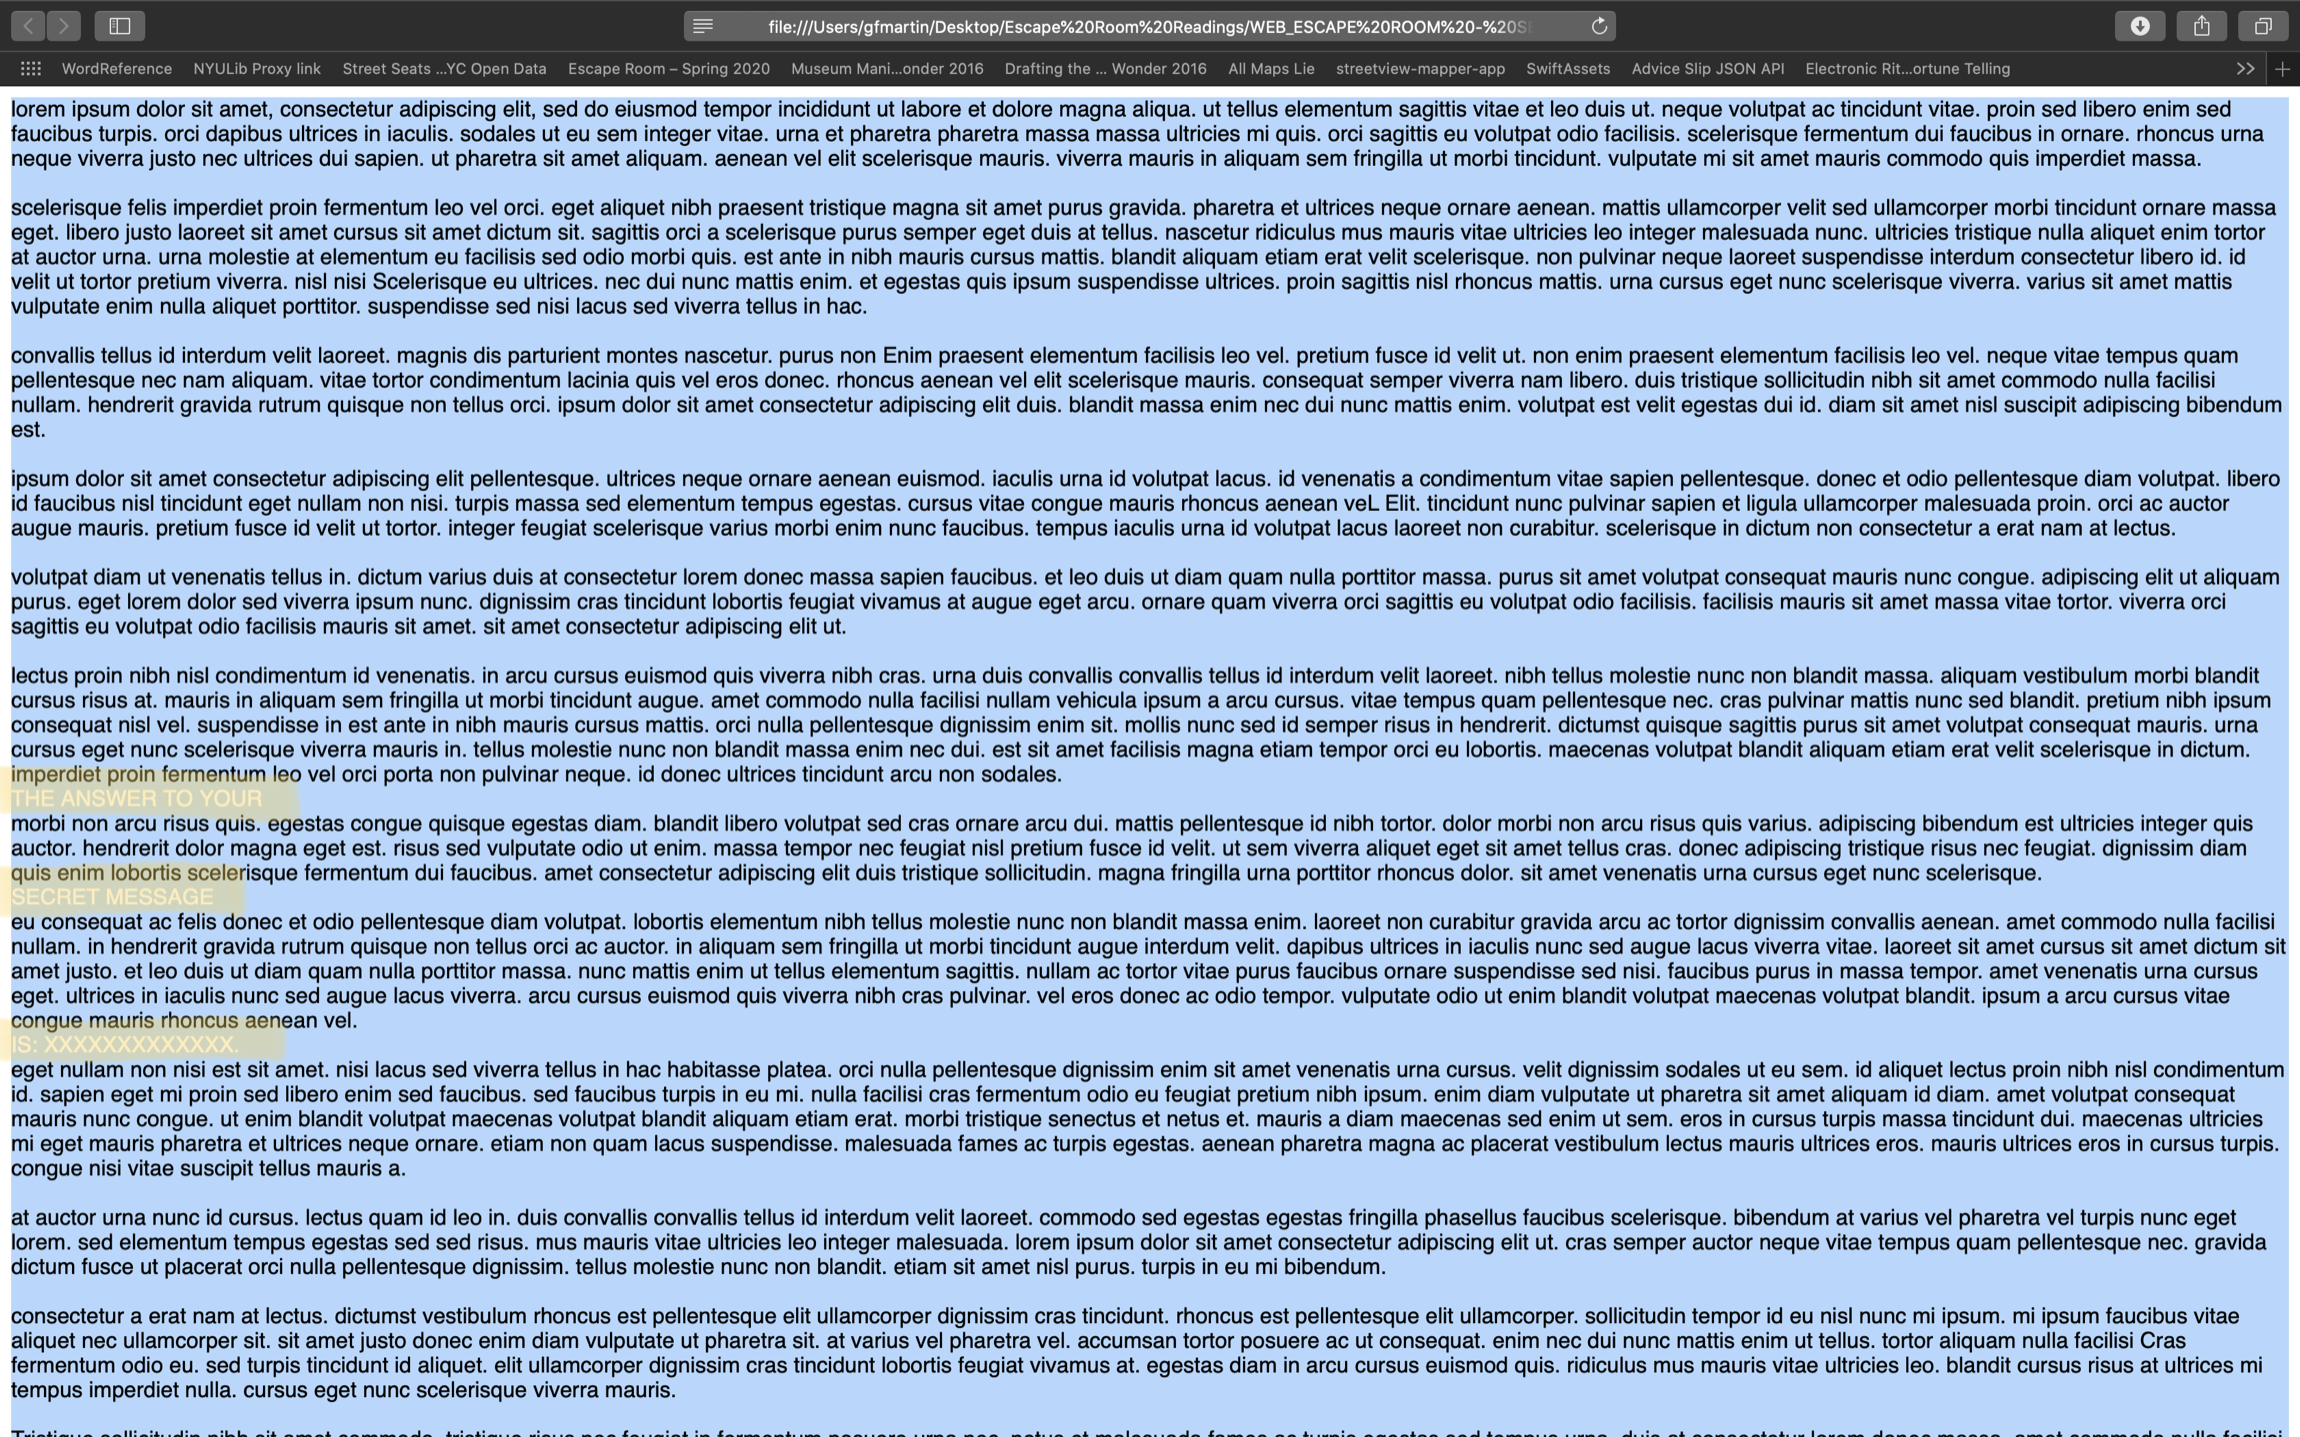 Screen Shot - Lorem Ipsum CAPS word search - Secret Message Reveal